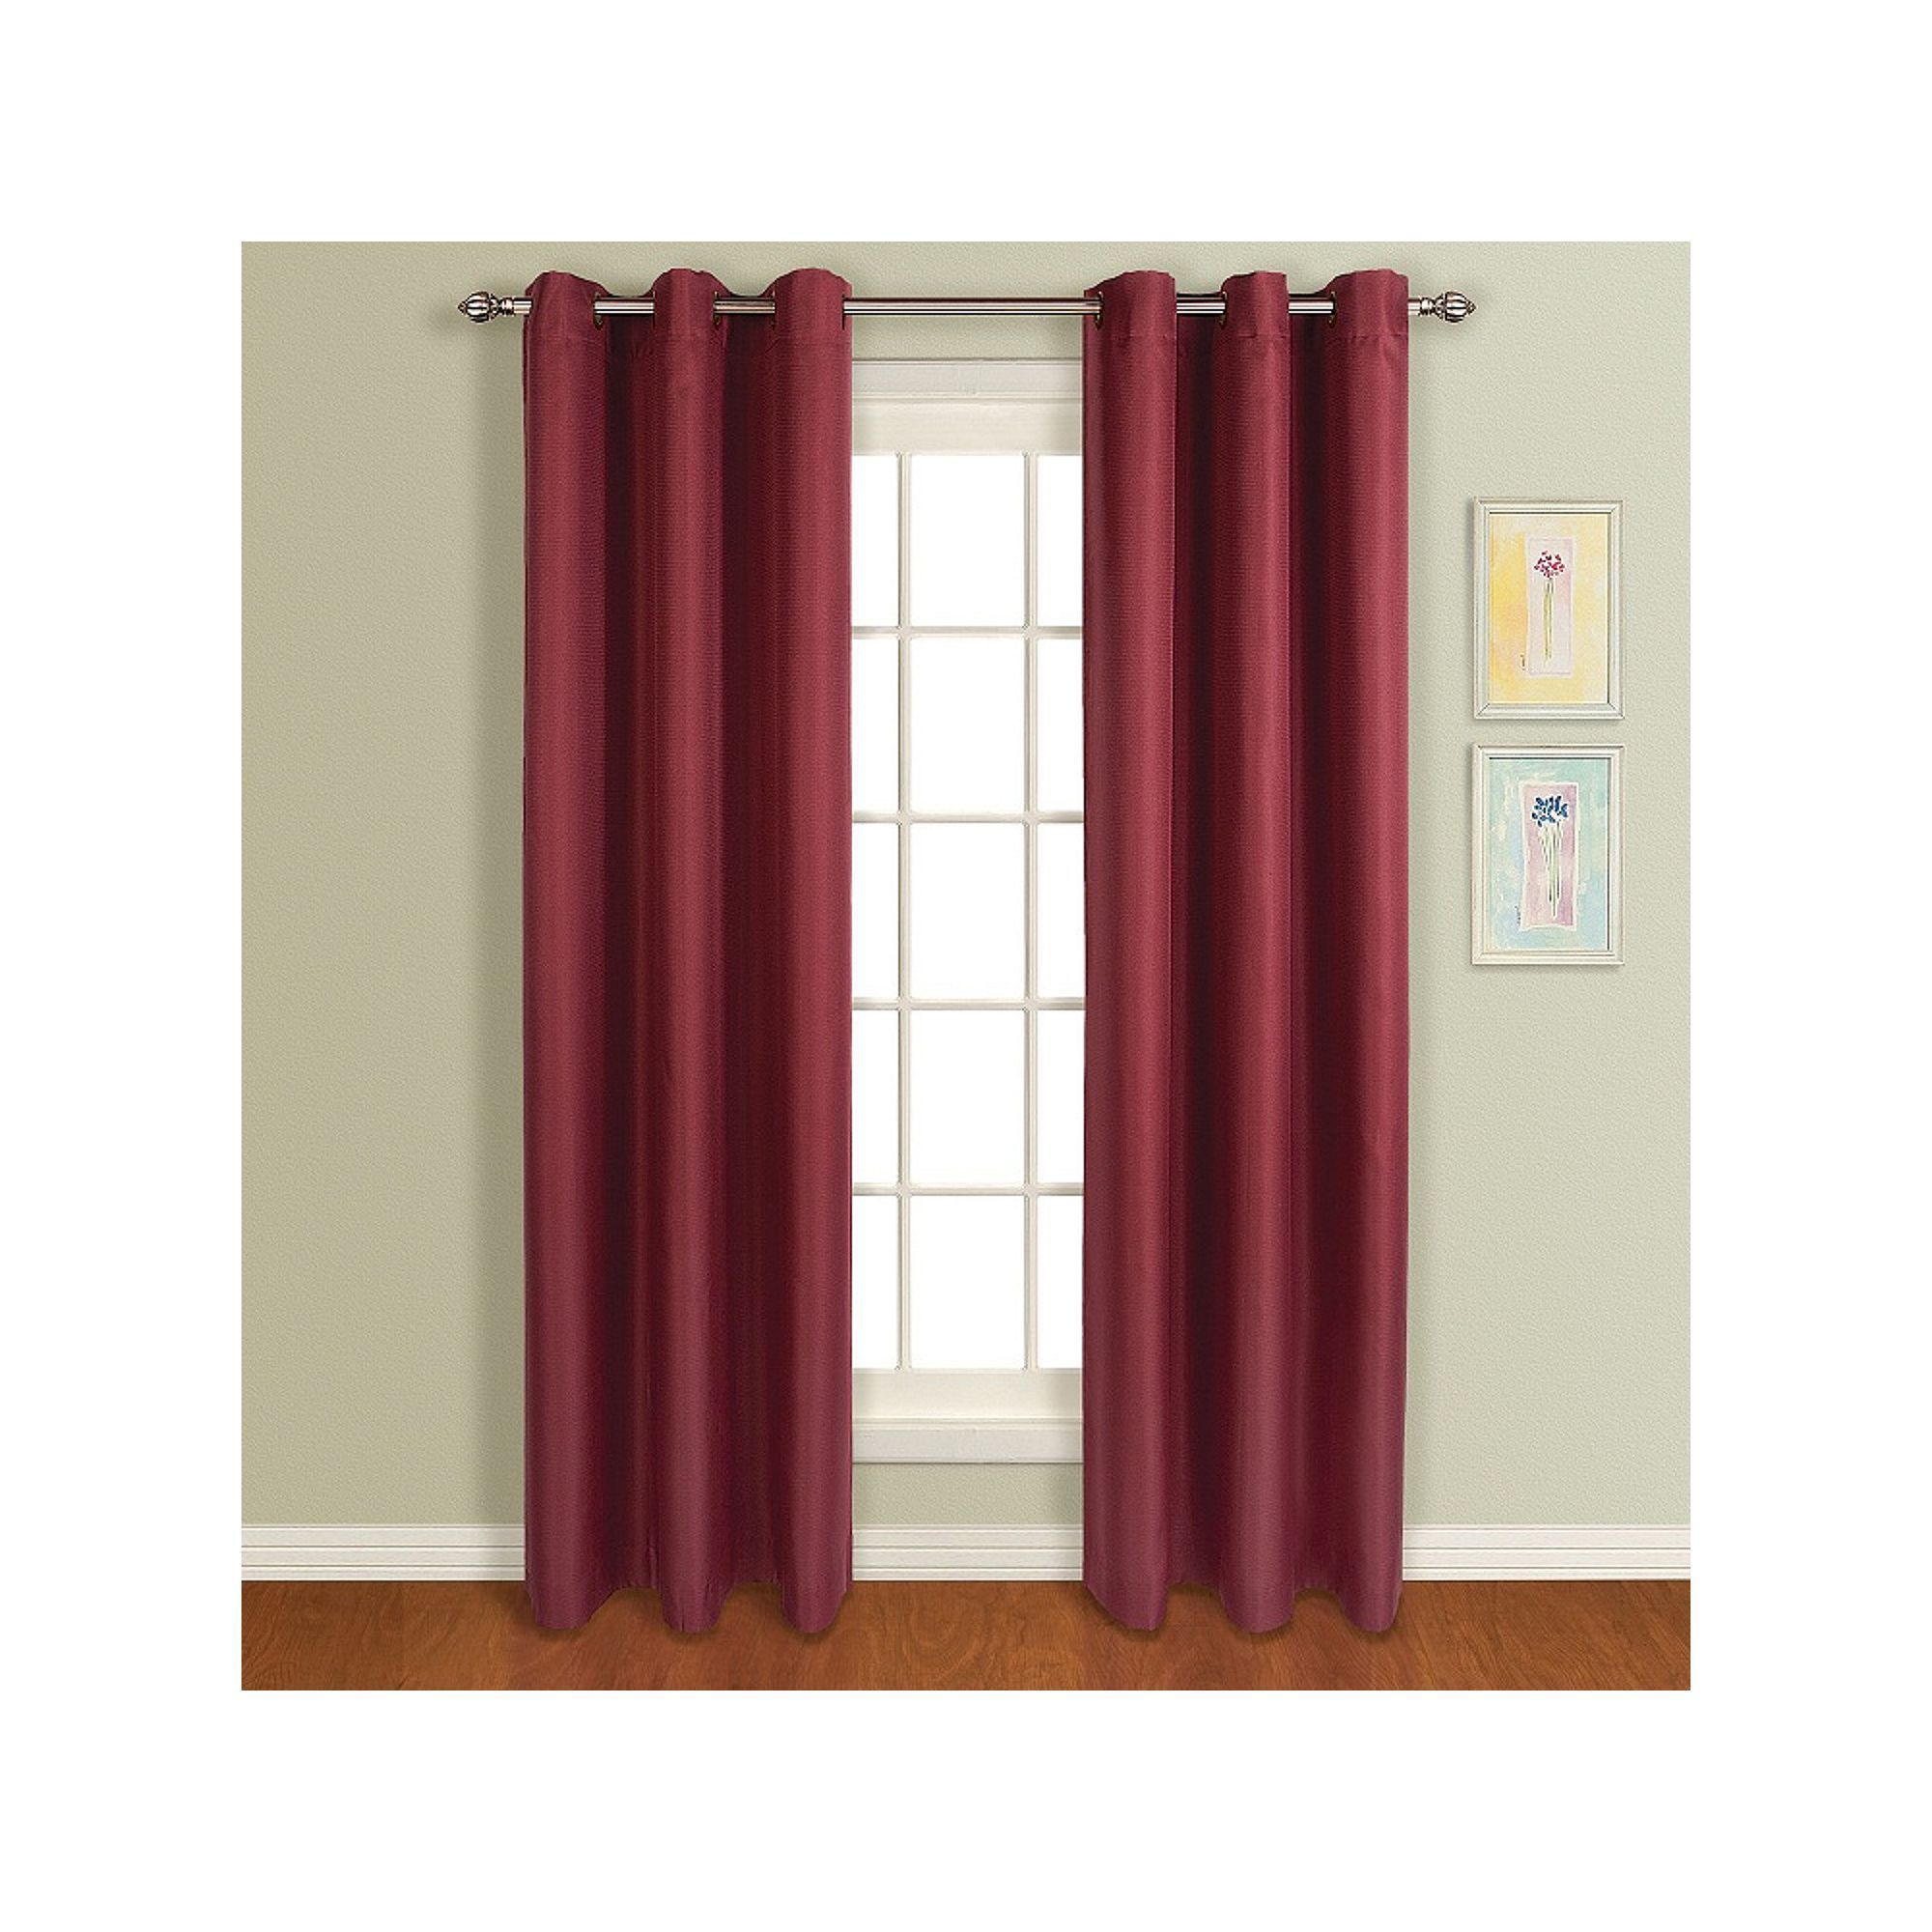 United Curtain Co Dupioni Silk 84 Inch Rod Pocket Blackout Window